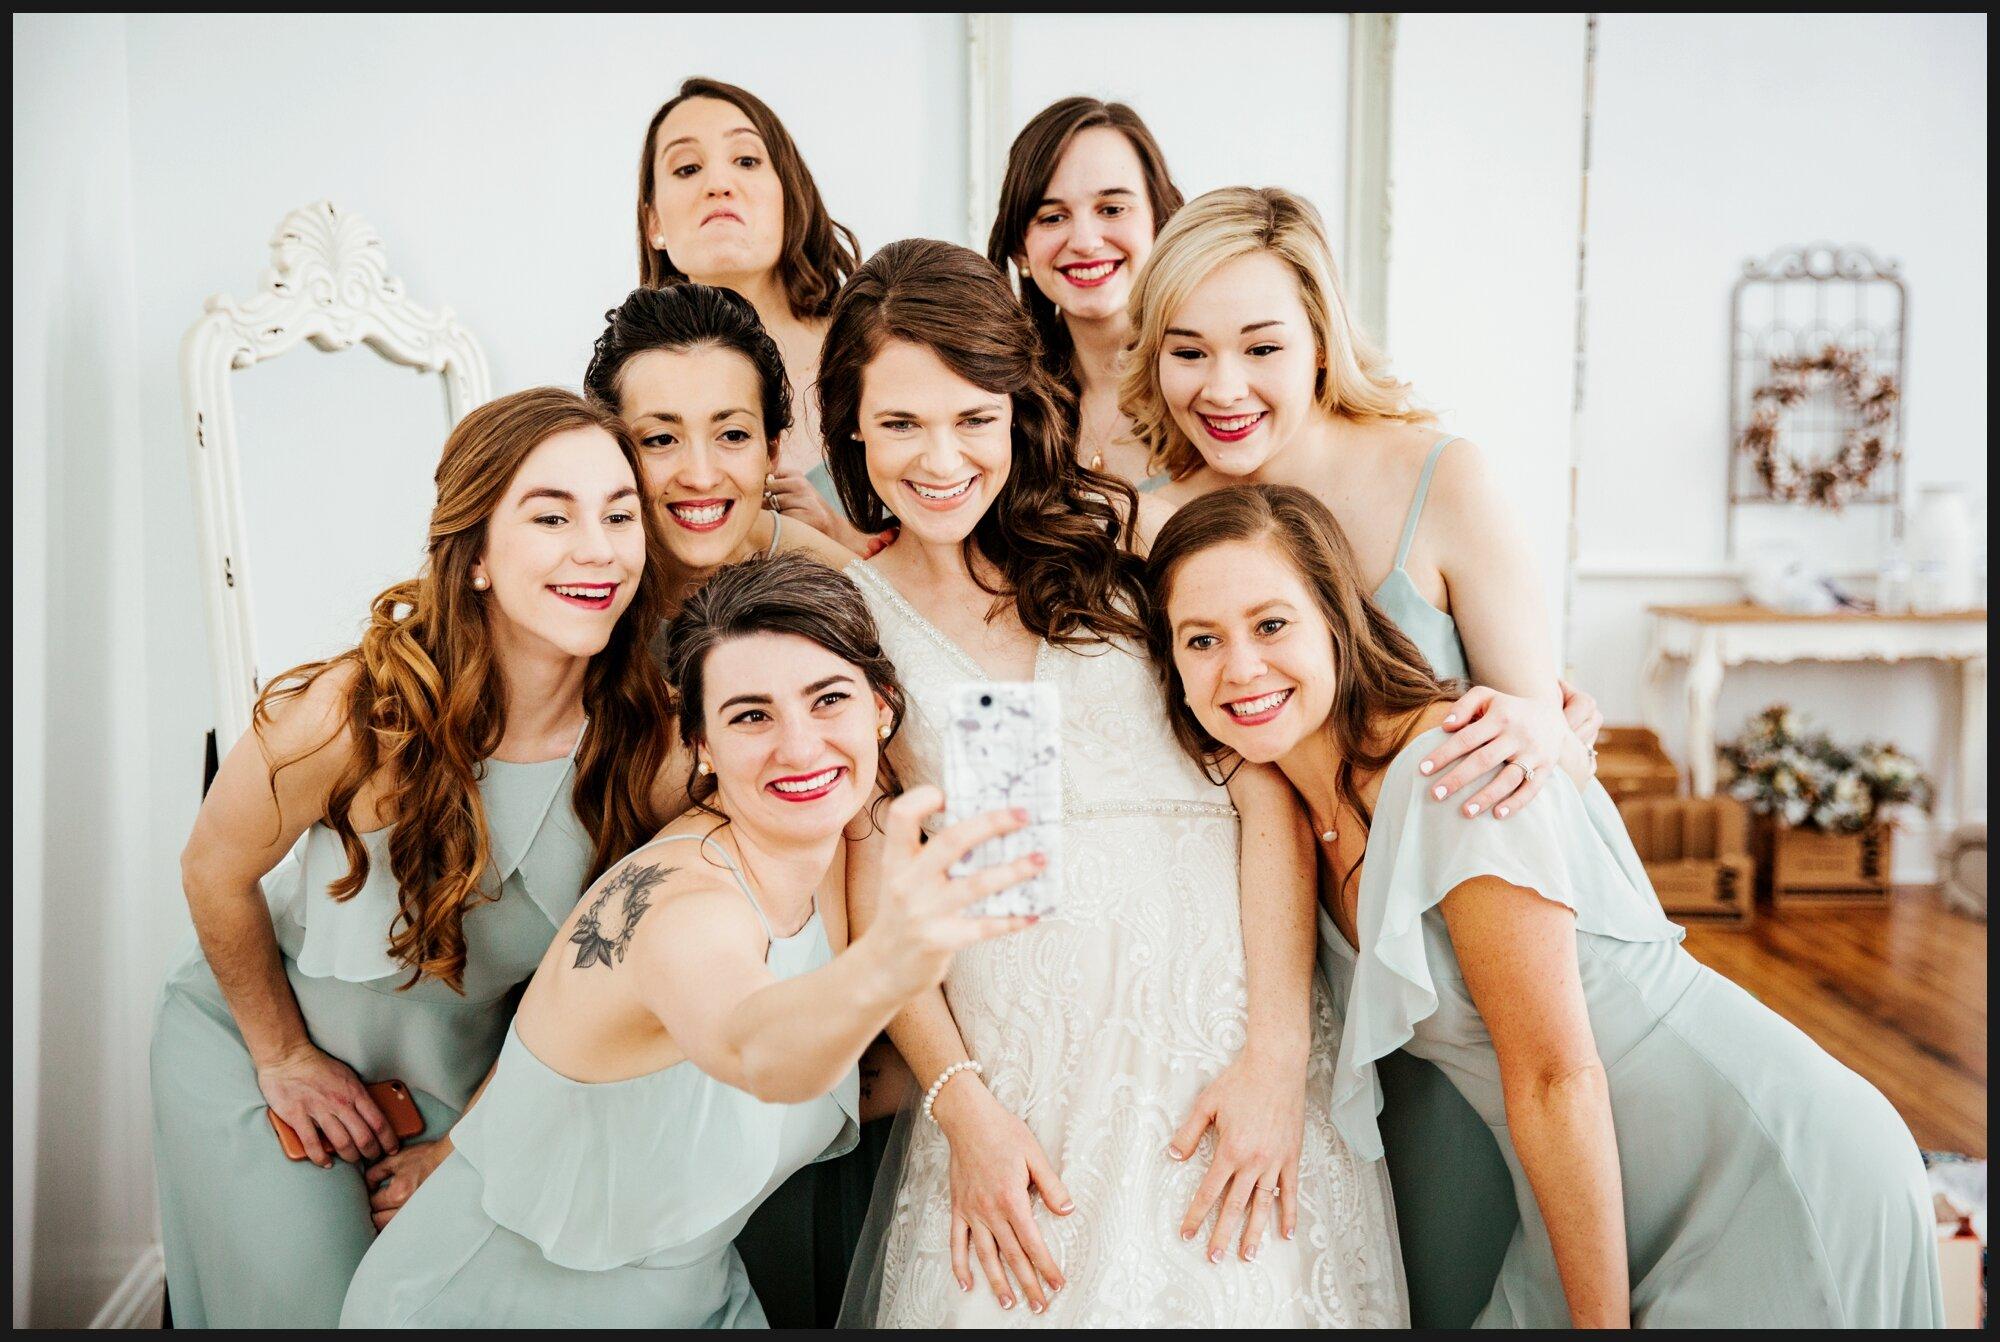 Orlando-Wedding-Photographer-destination-wedding-photographer-florida-wedding-photographer-hawaii-wedding-photographer_0656.jpg